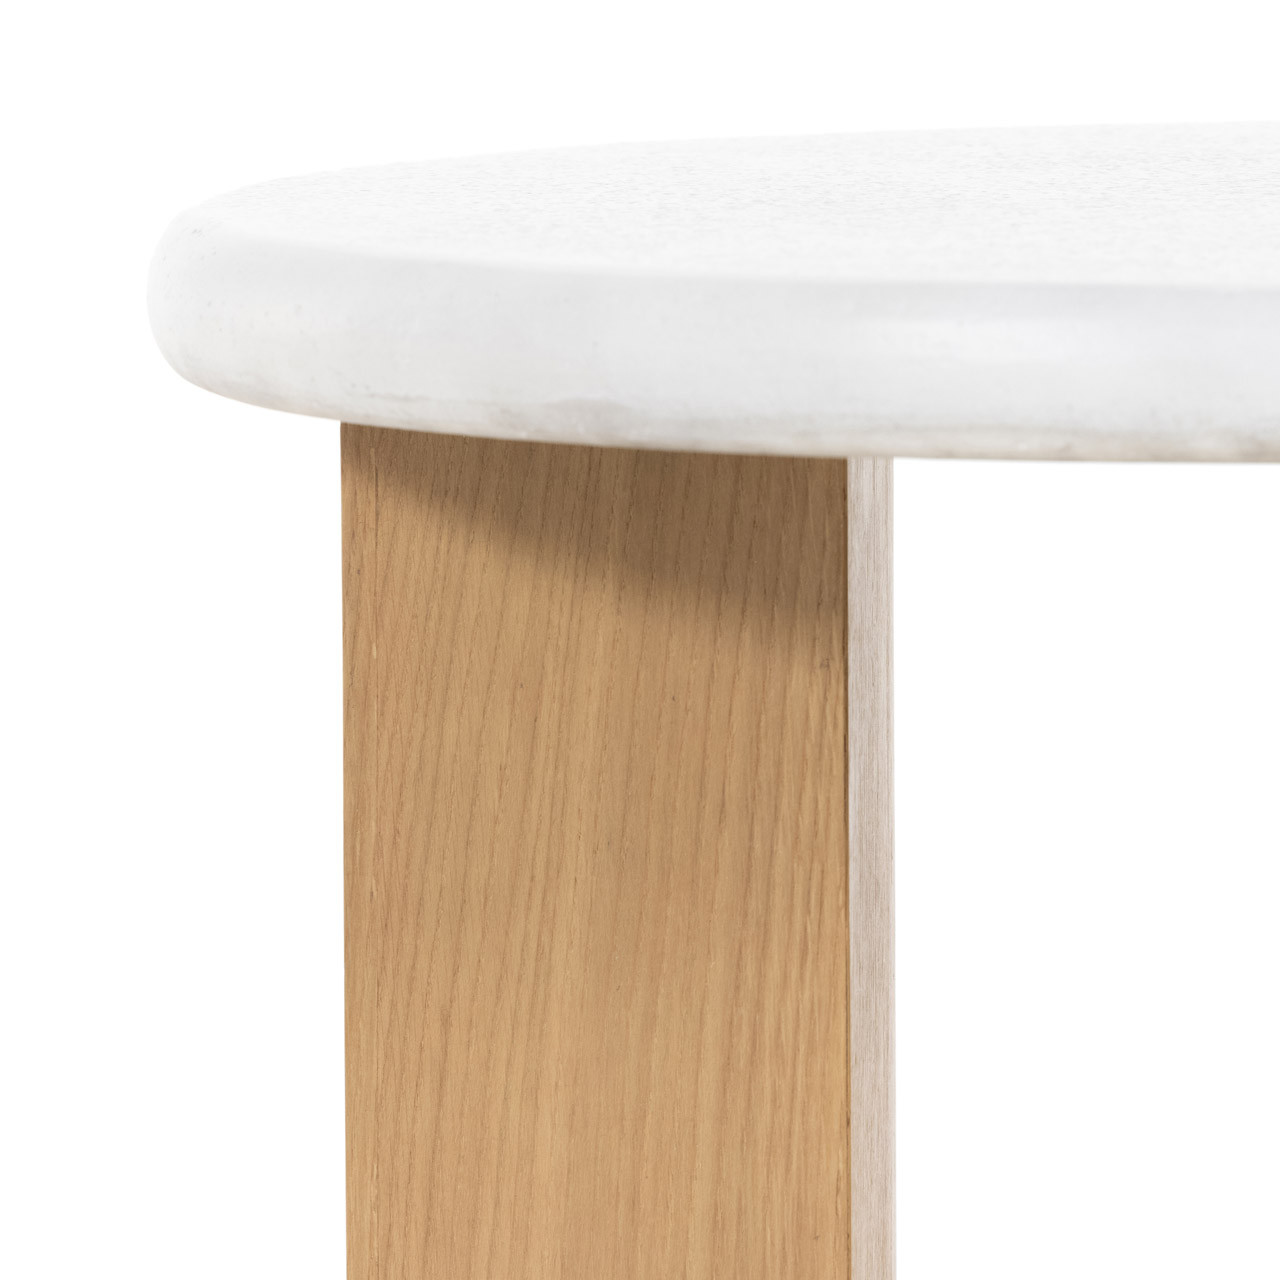 Arte Nightstand - Stucco White